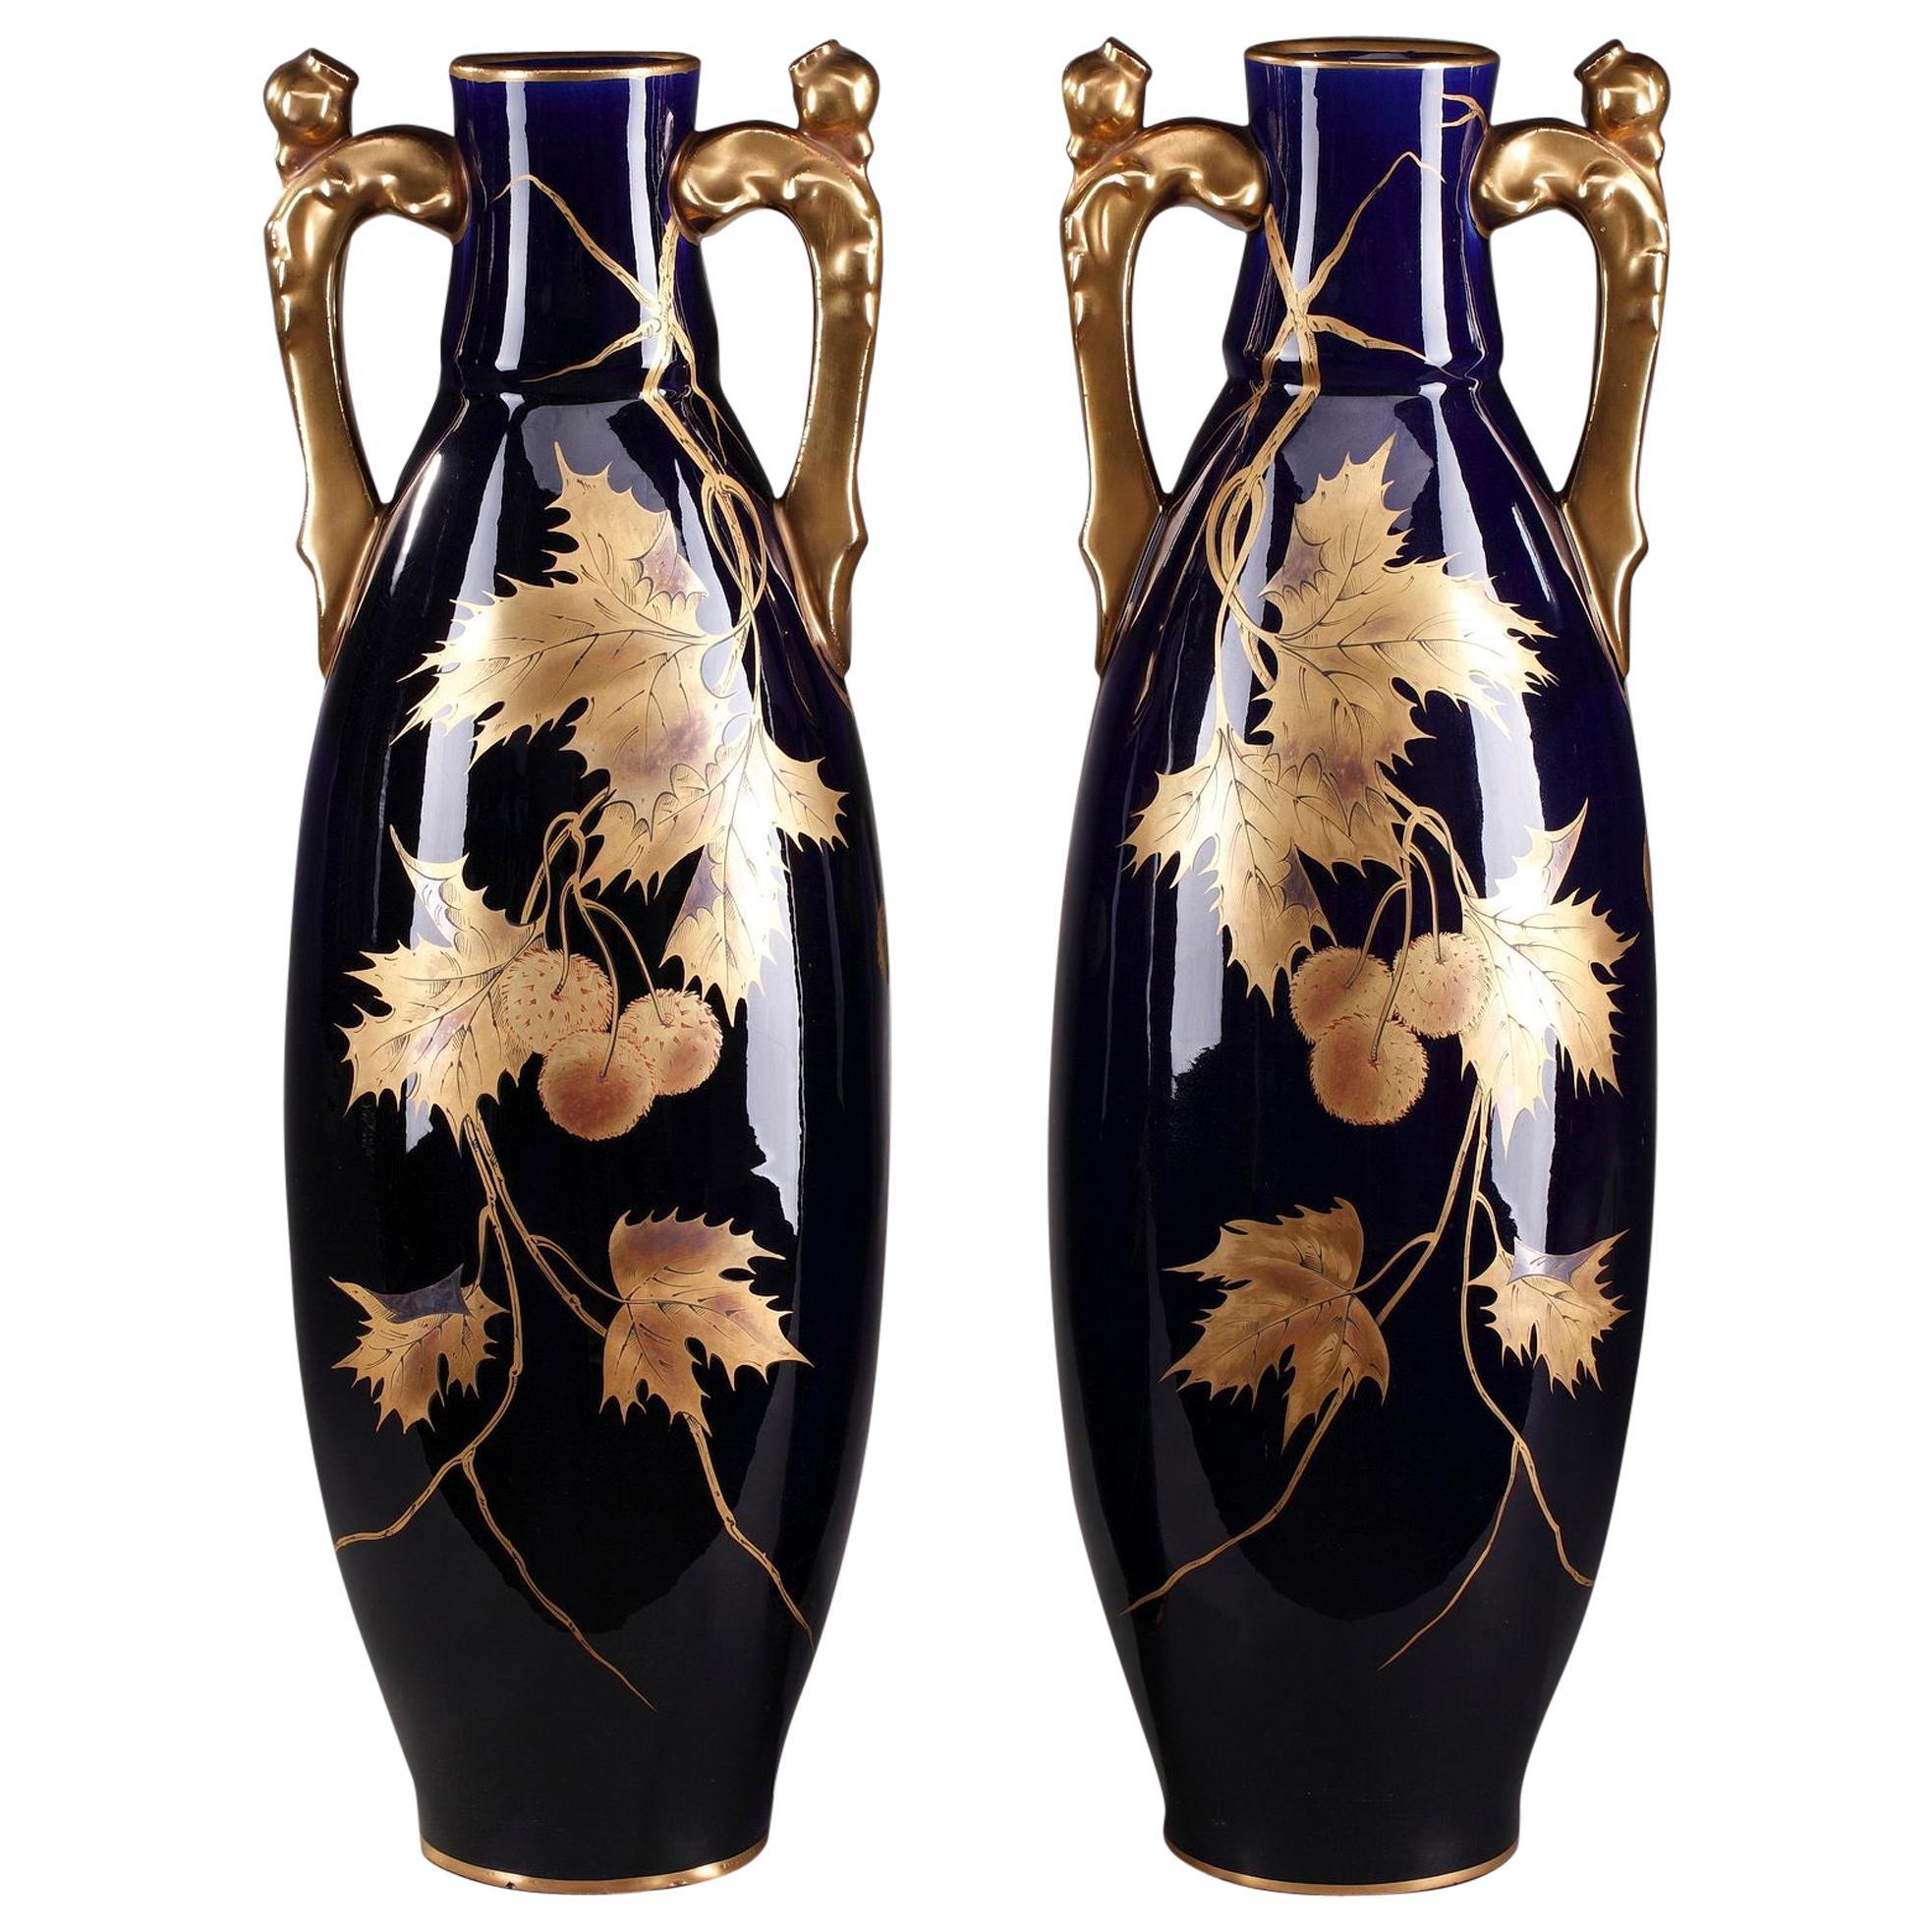 Late 19th Century Gustave Asch Blue Ceramic Vases